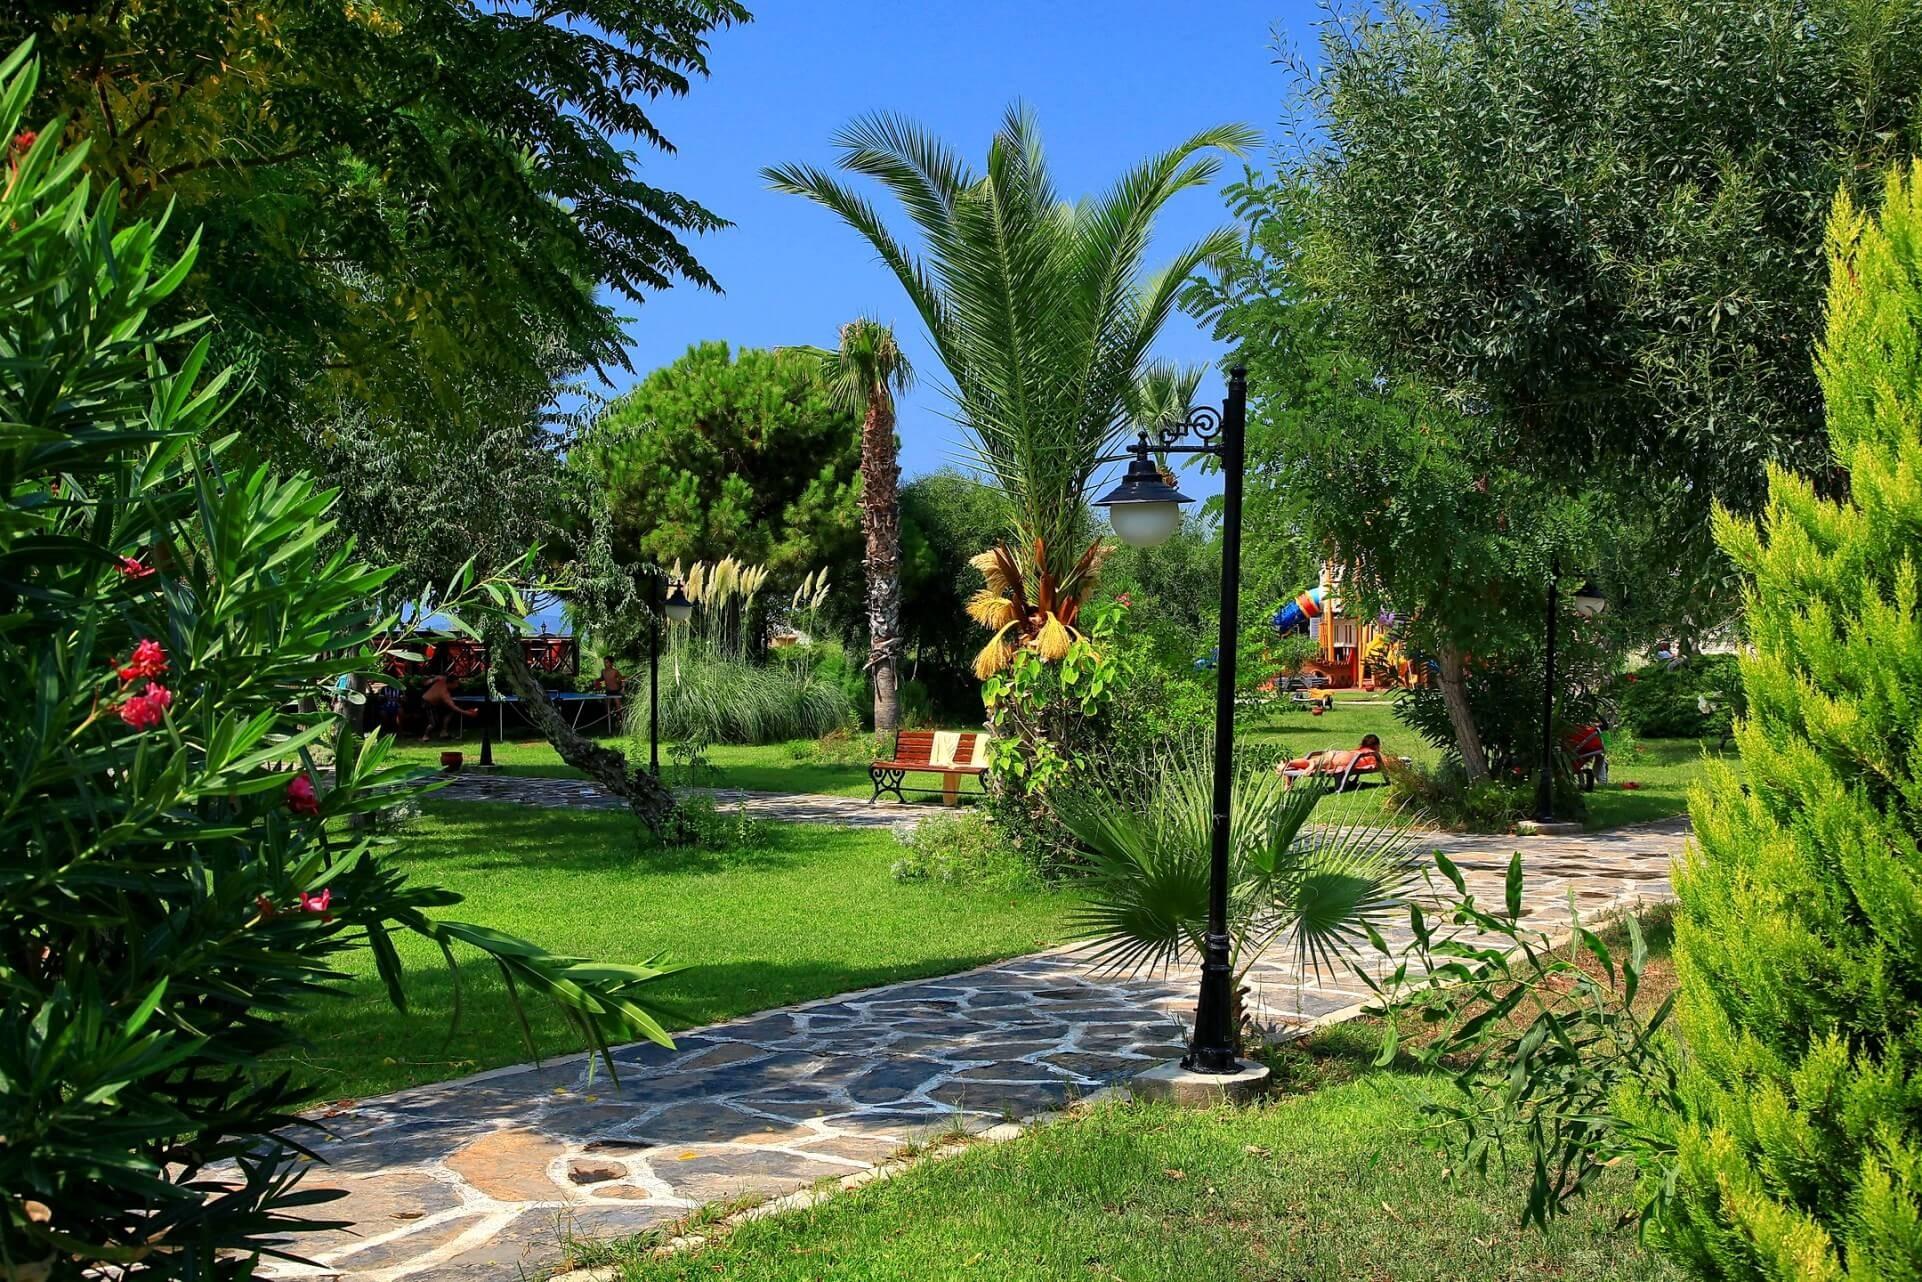 Cactus Club Yalı & Resort - общ изглед